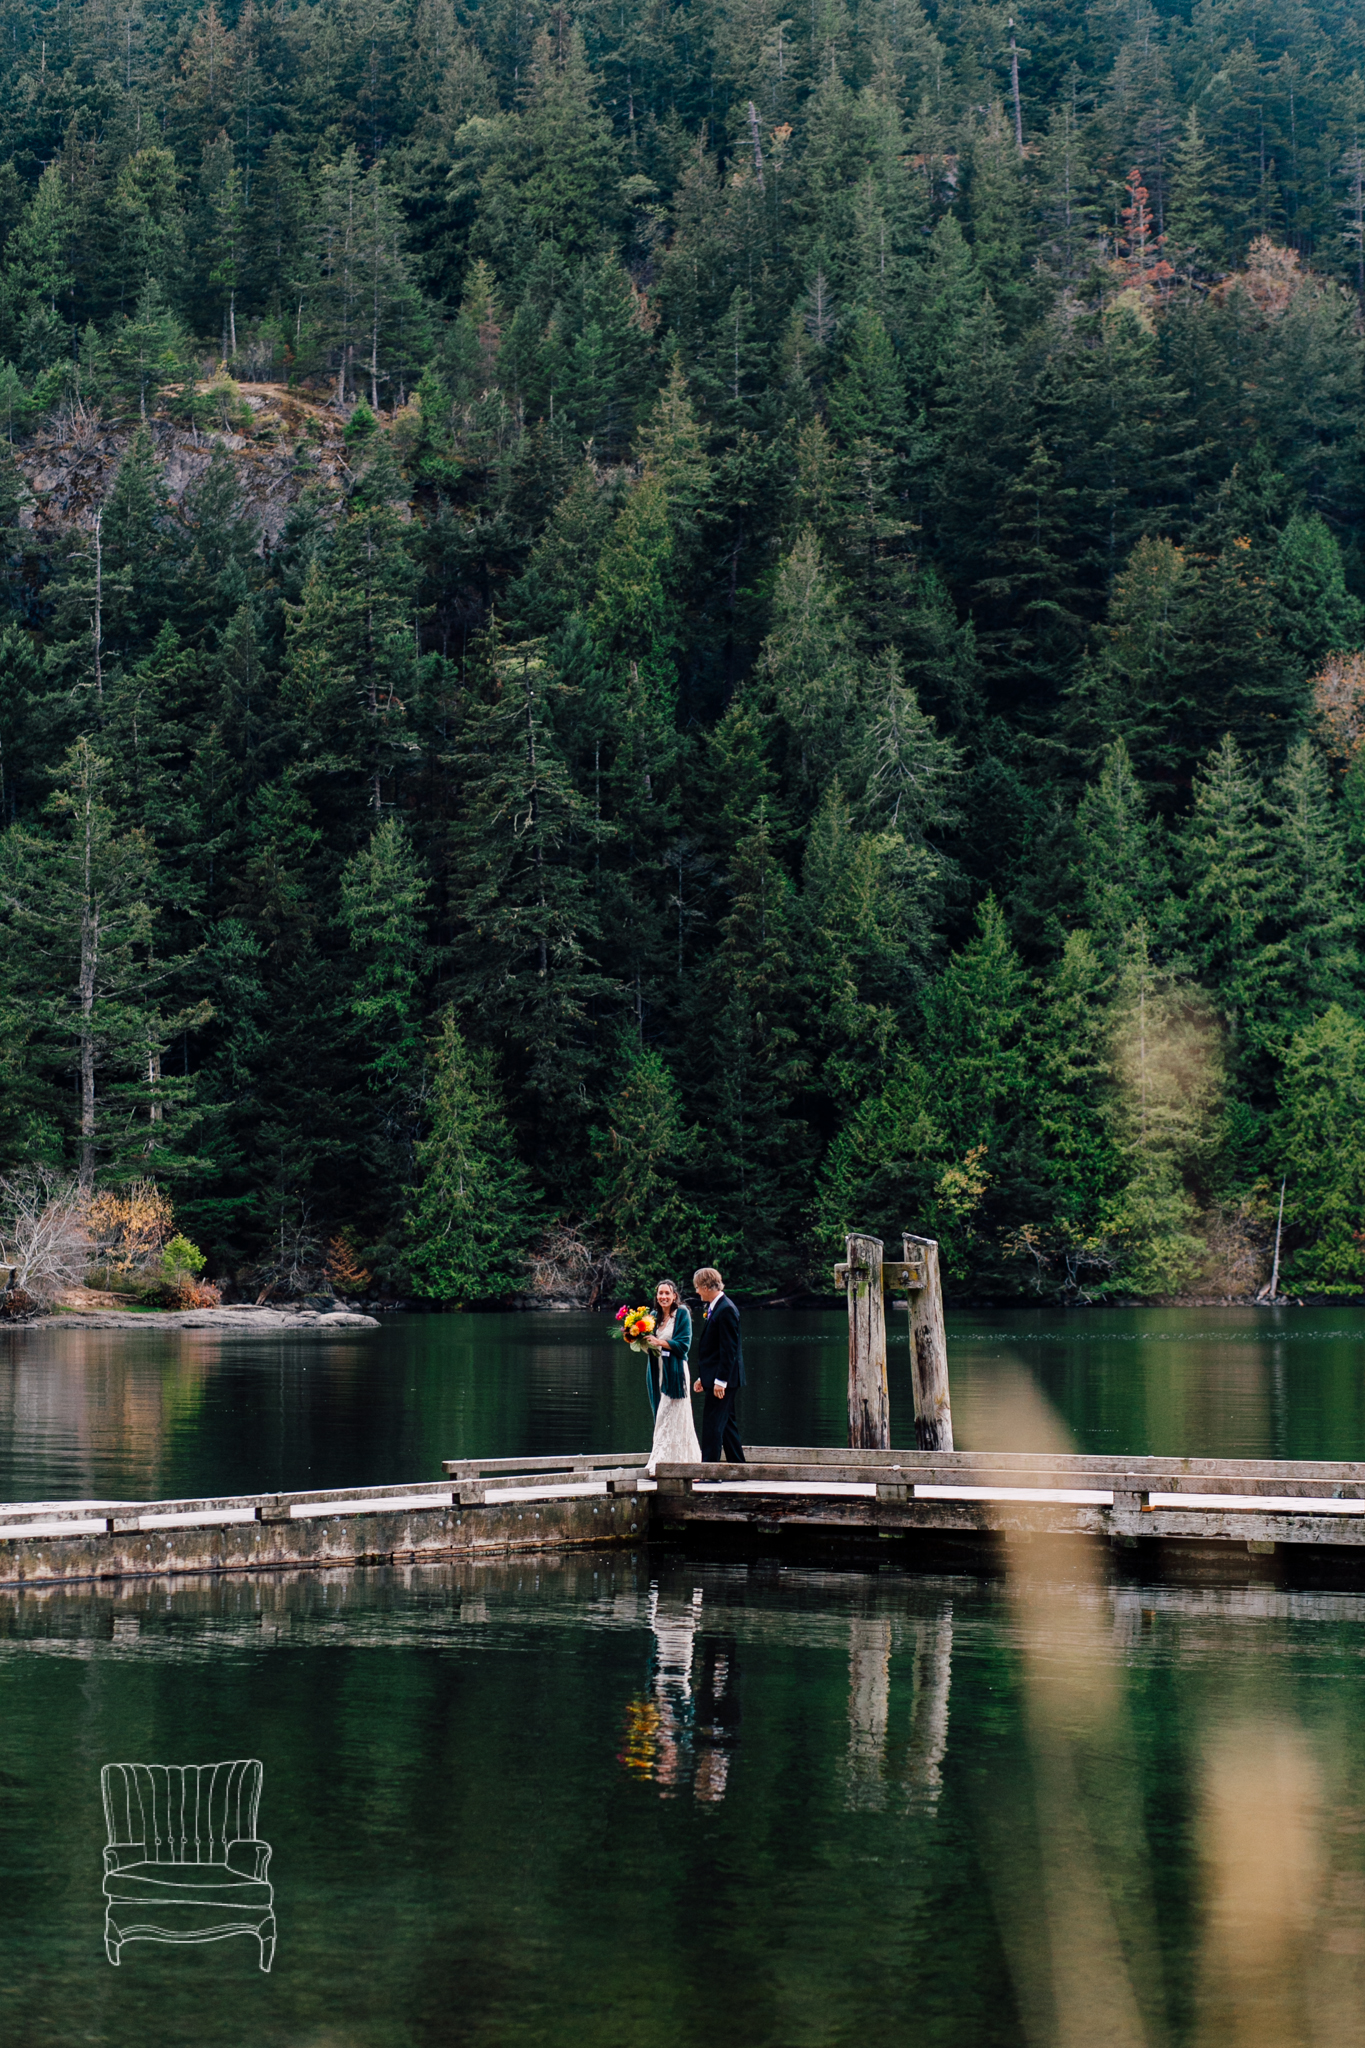 orcas-island-moran-state-park-wedding-katheryn-moran-jessicashawn-11.jpg